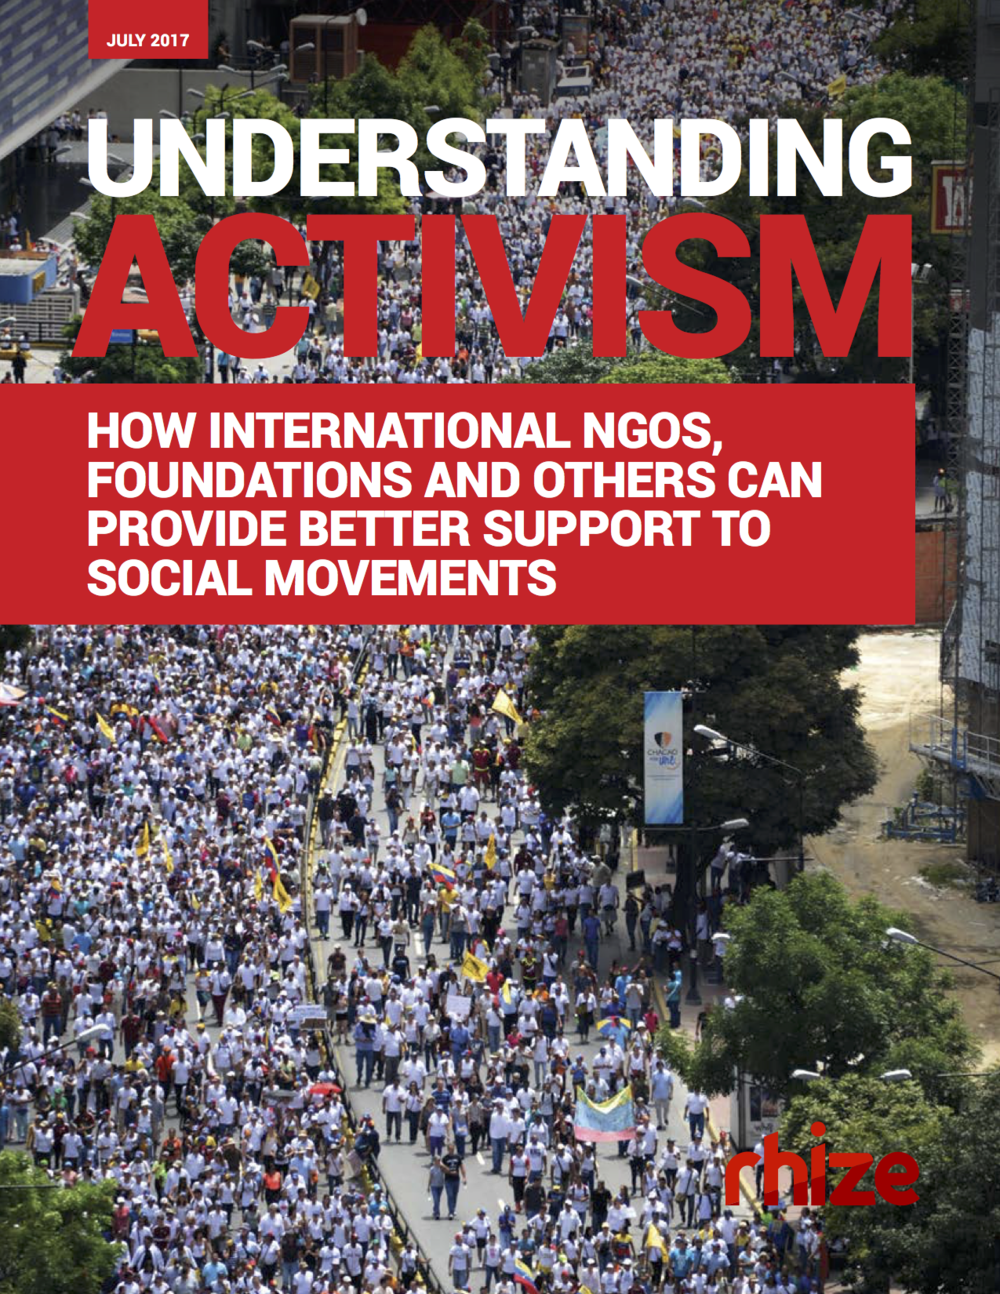 Understanding Activism cover.png